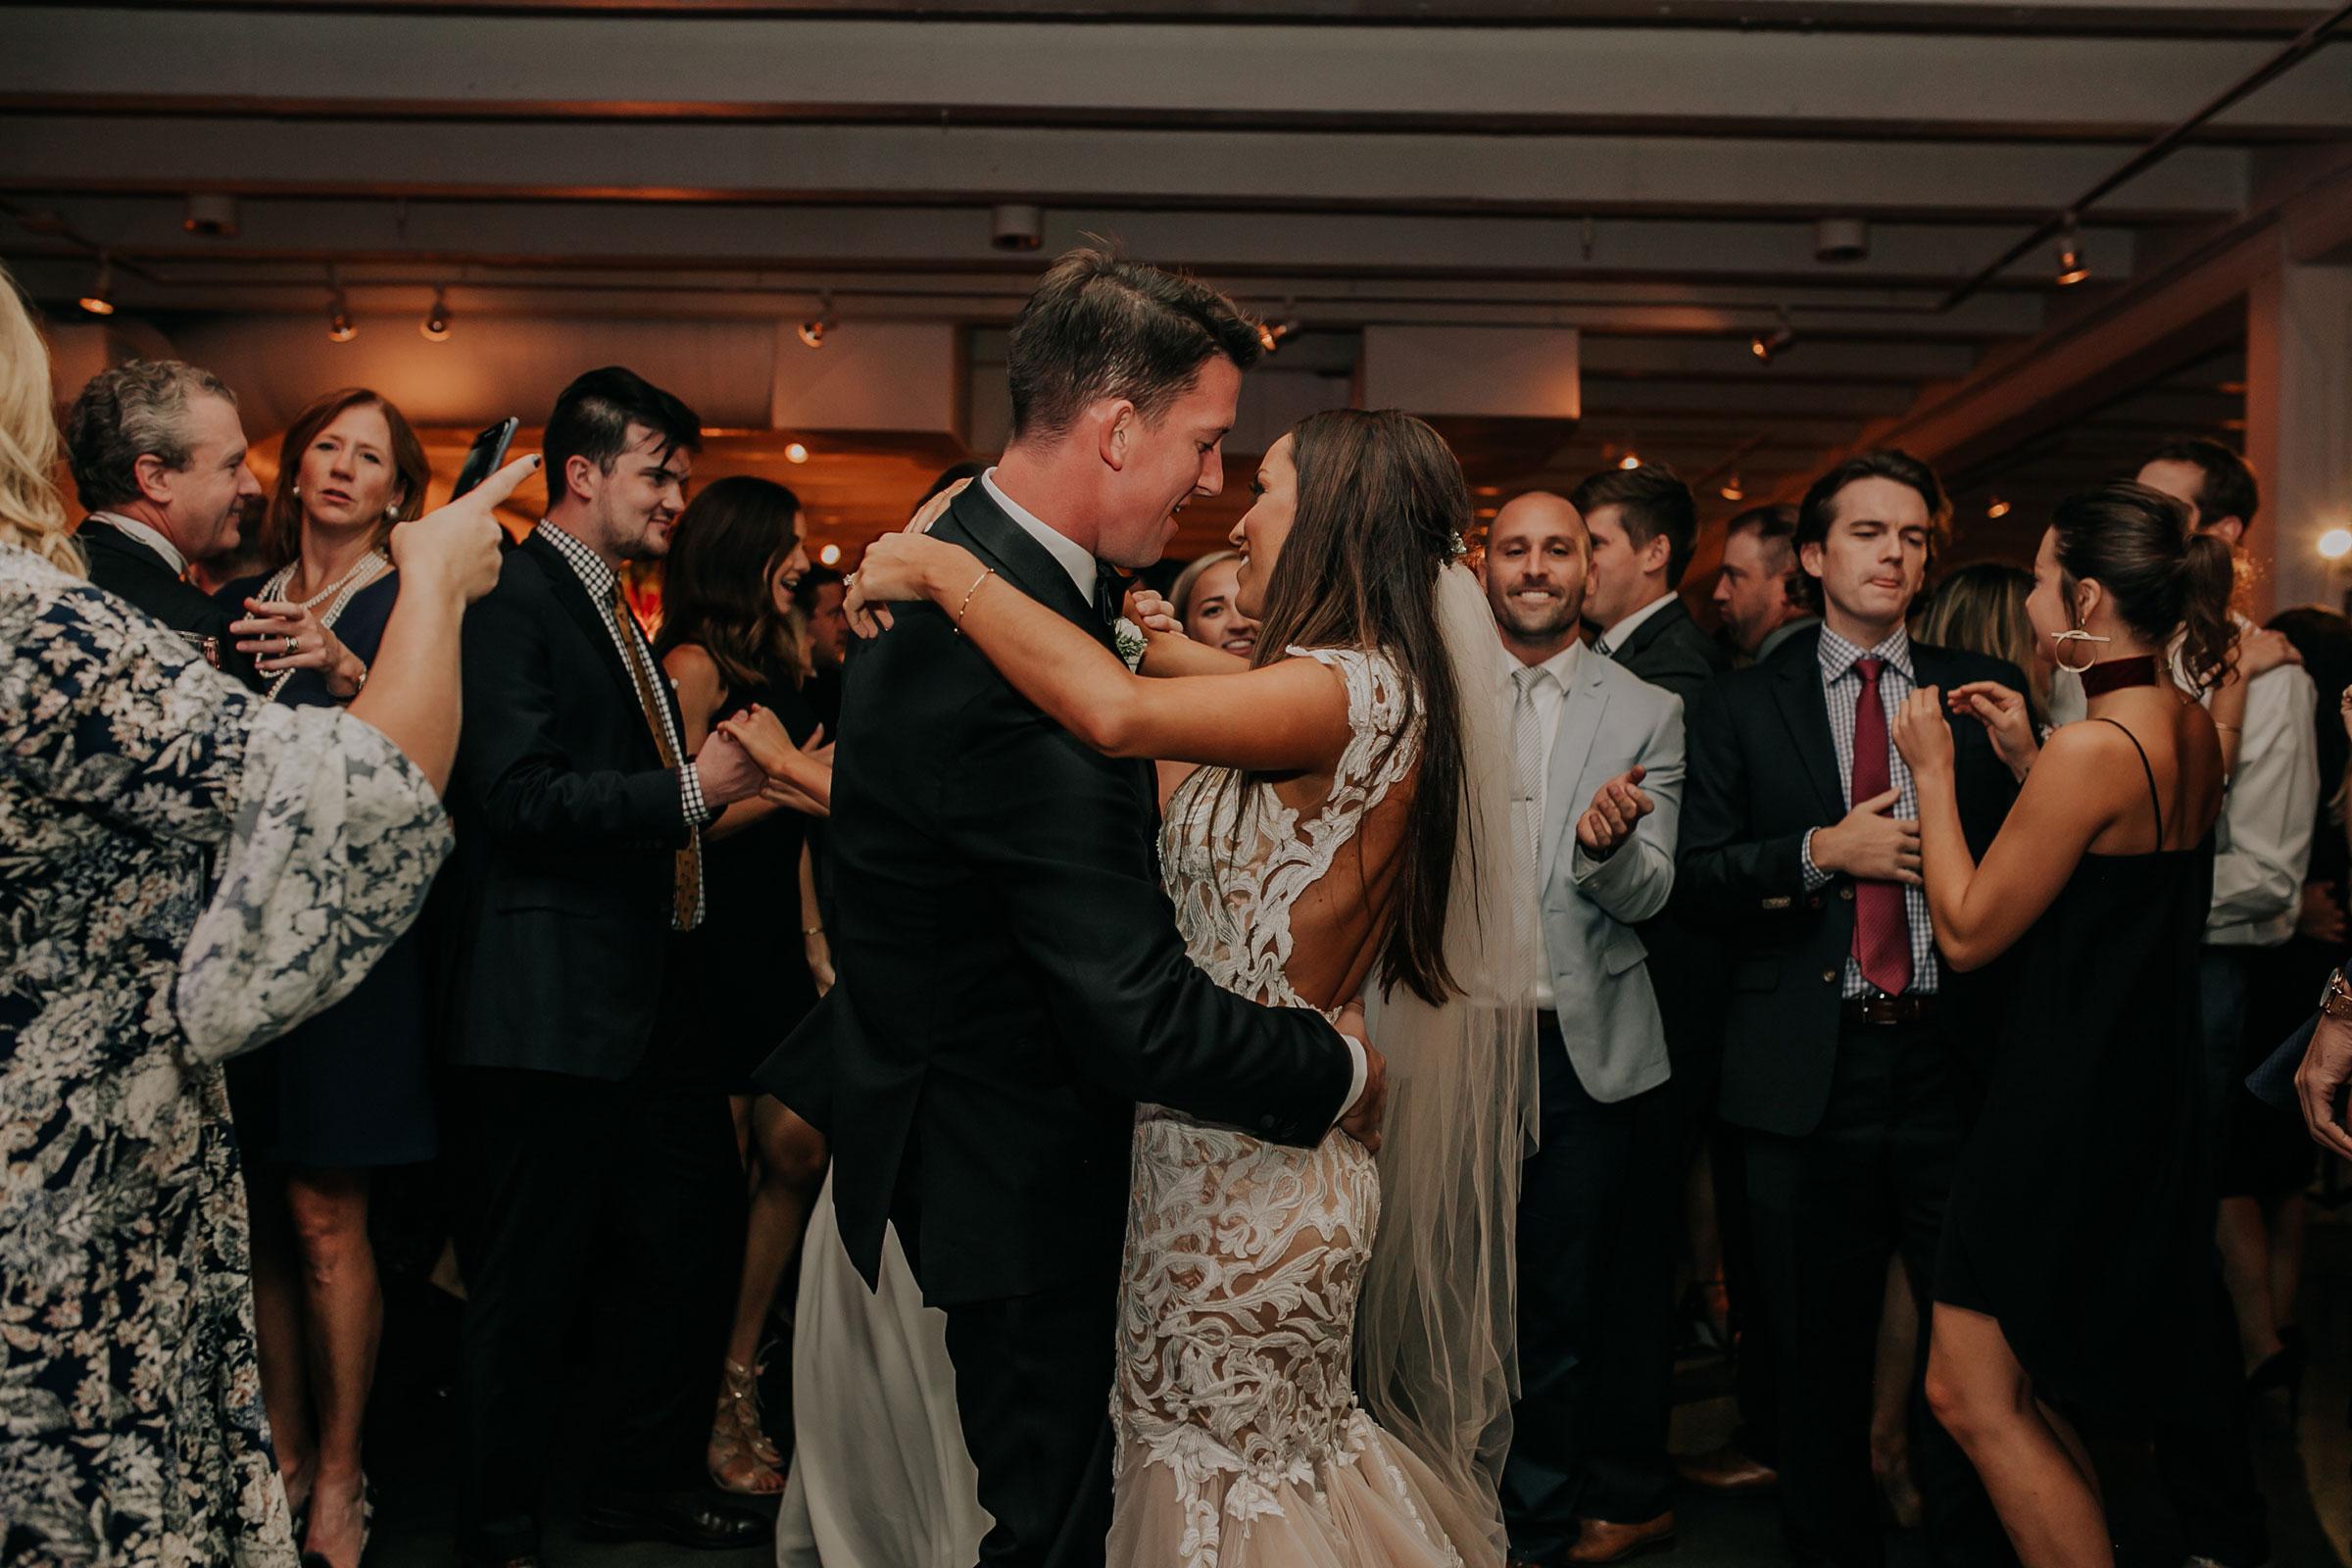 bride-groom-dancing-with-guests-surrounding-them-founders-one-nine-omaha-nebraska-raelyn-ramey-photography.jpg